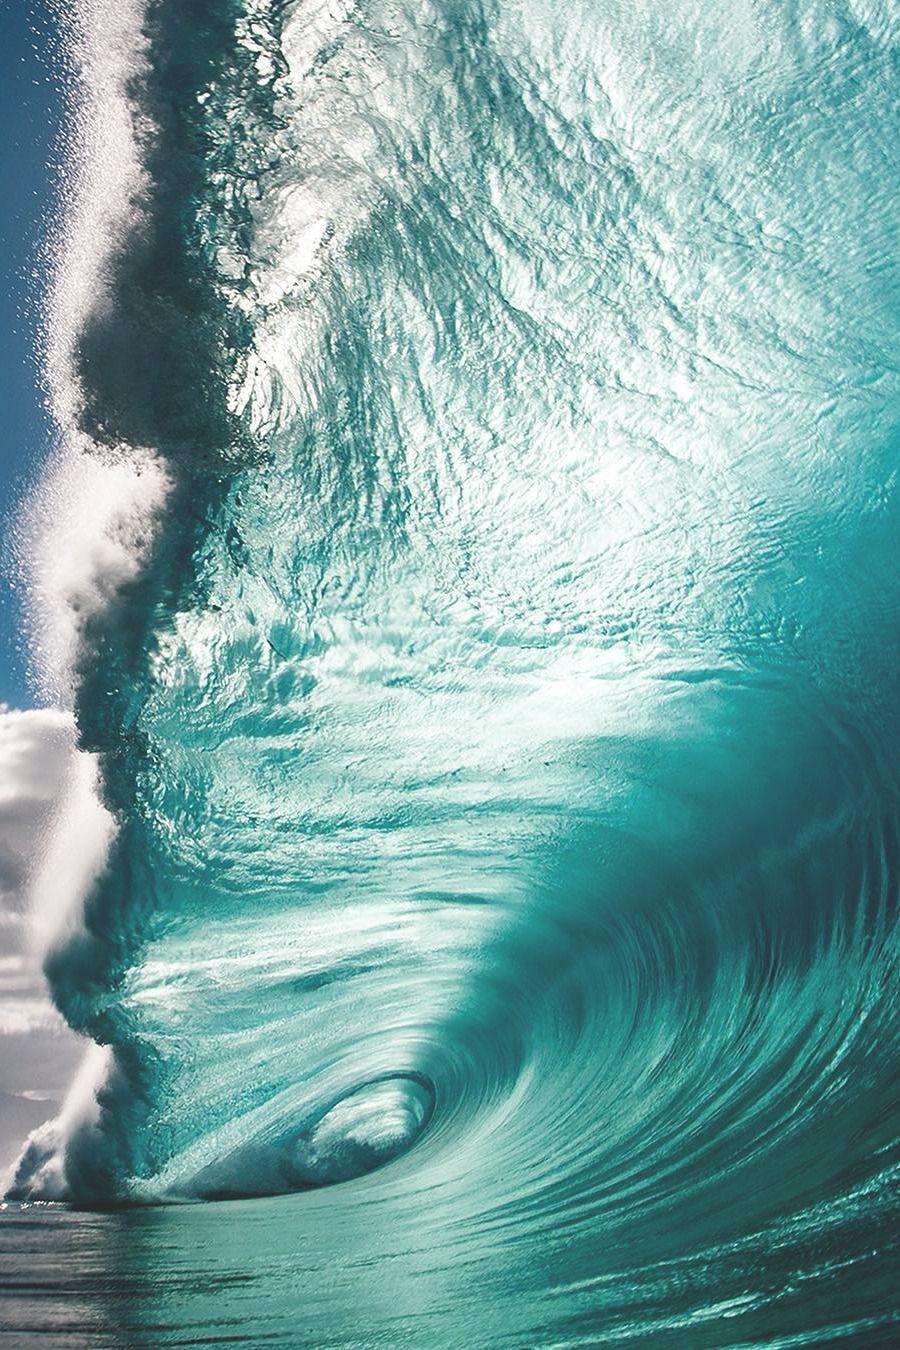 Surf And Sea Waves サーフィン おしゃれまとめの人気アイデア